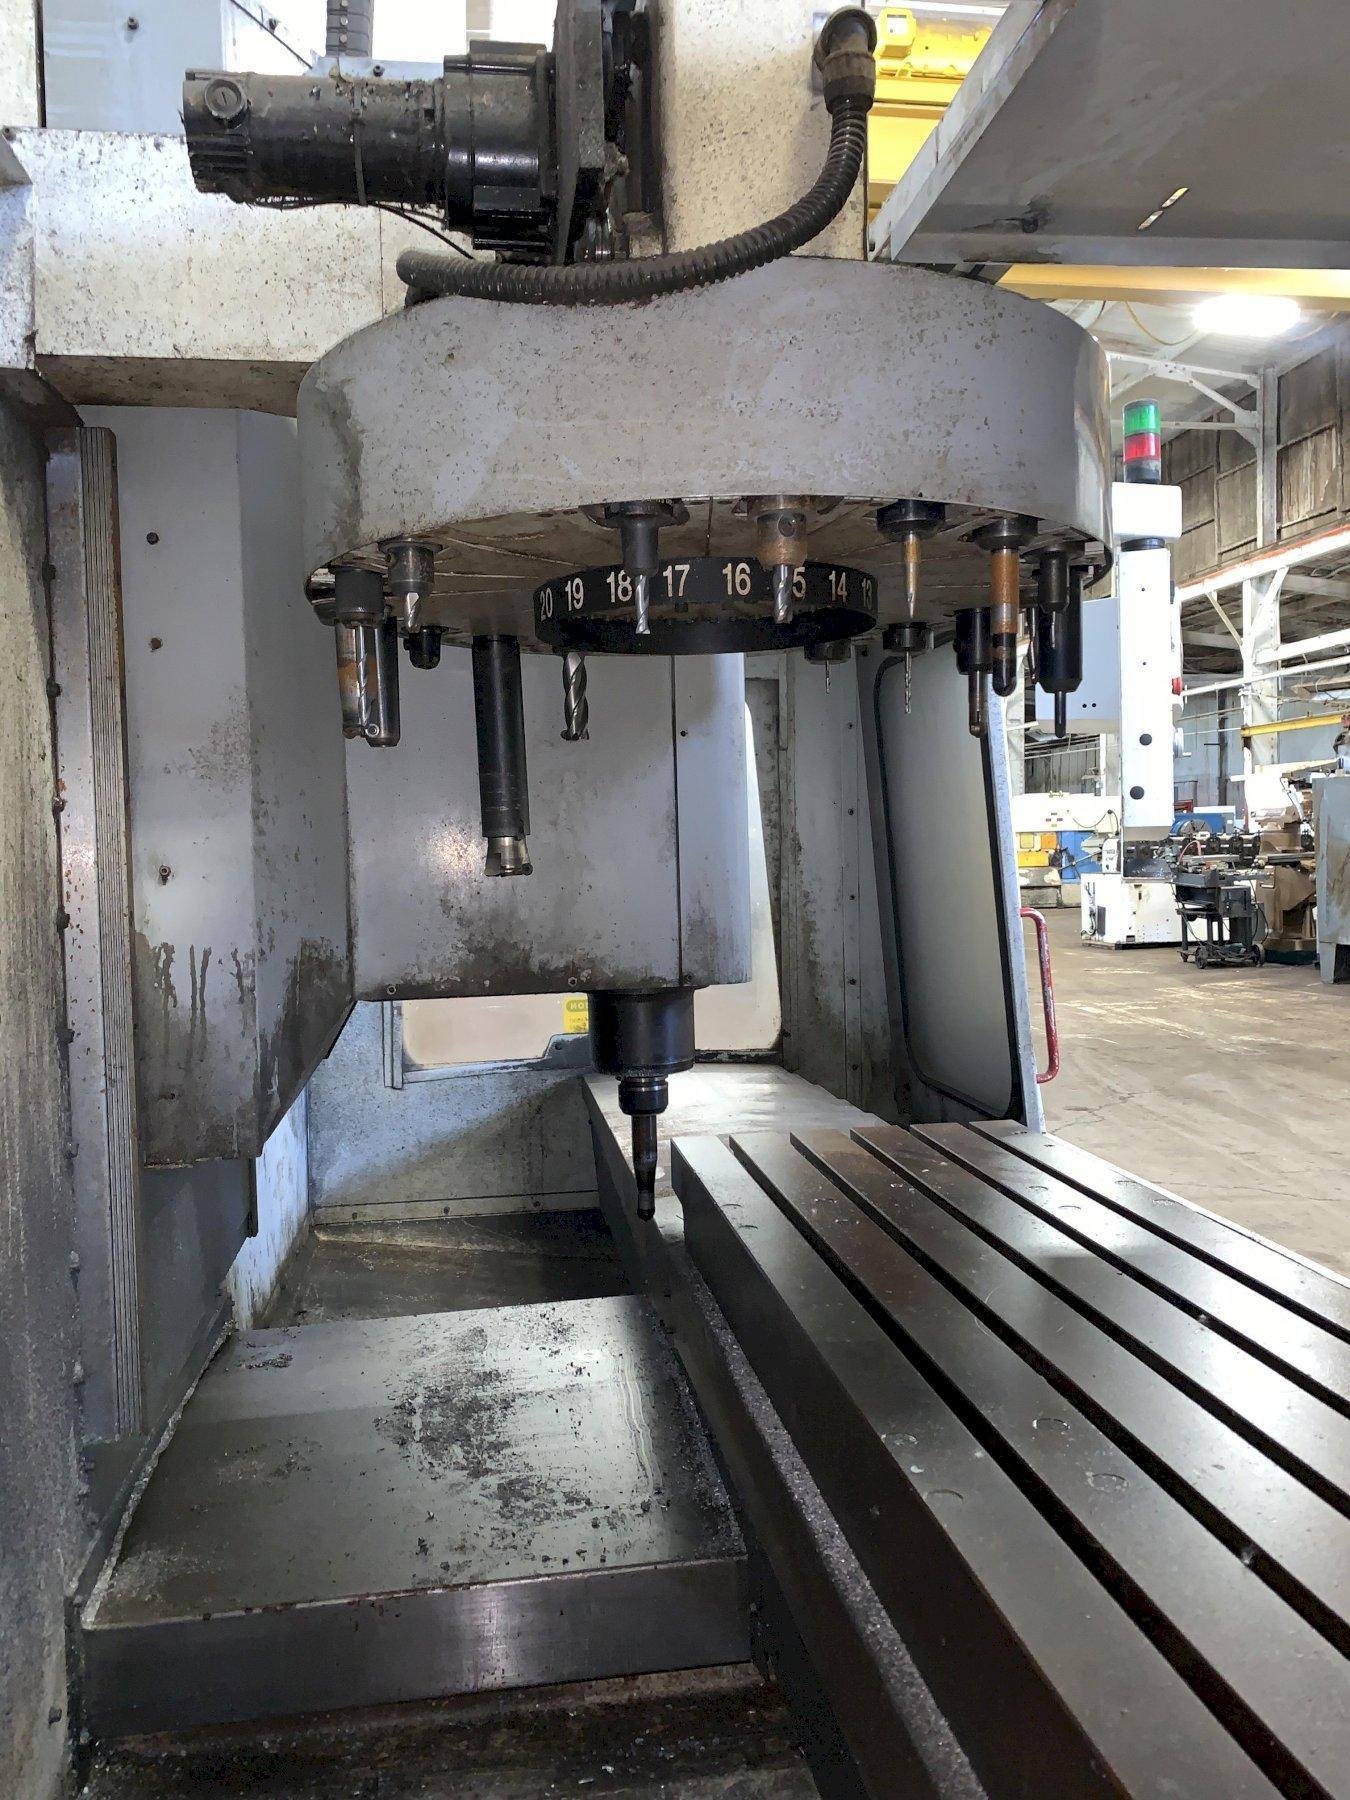 HAAS MODEL #VF4 VERTICAL MACHINING CENTER: STOCK 12216